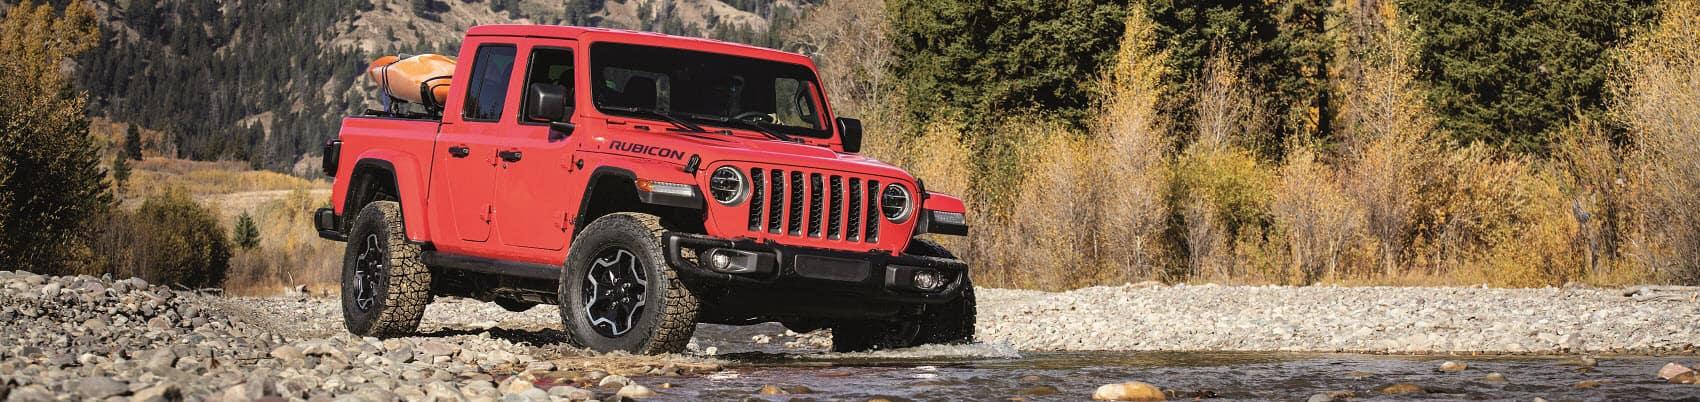 All-terrain Jeep Gladiator